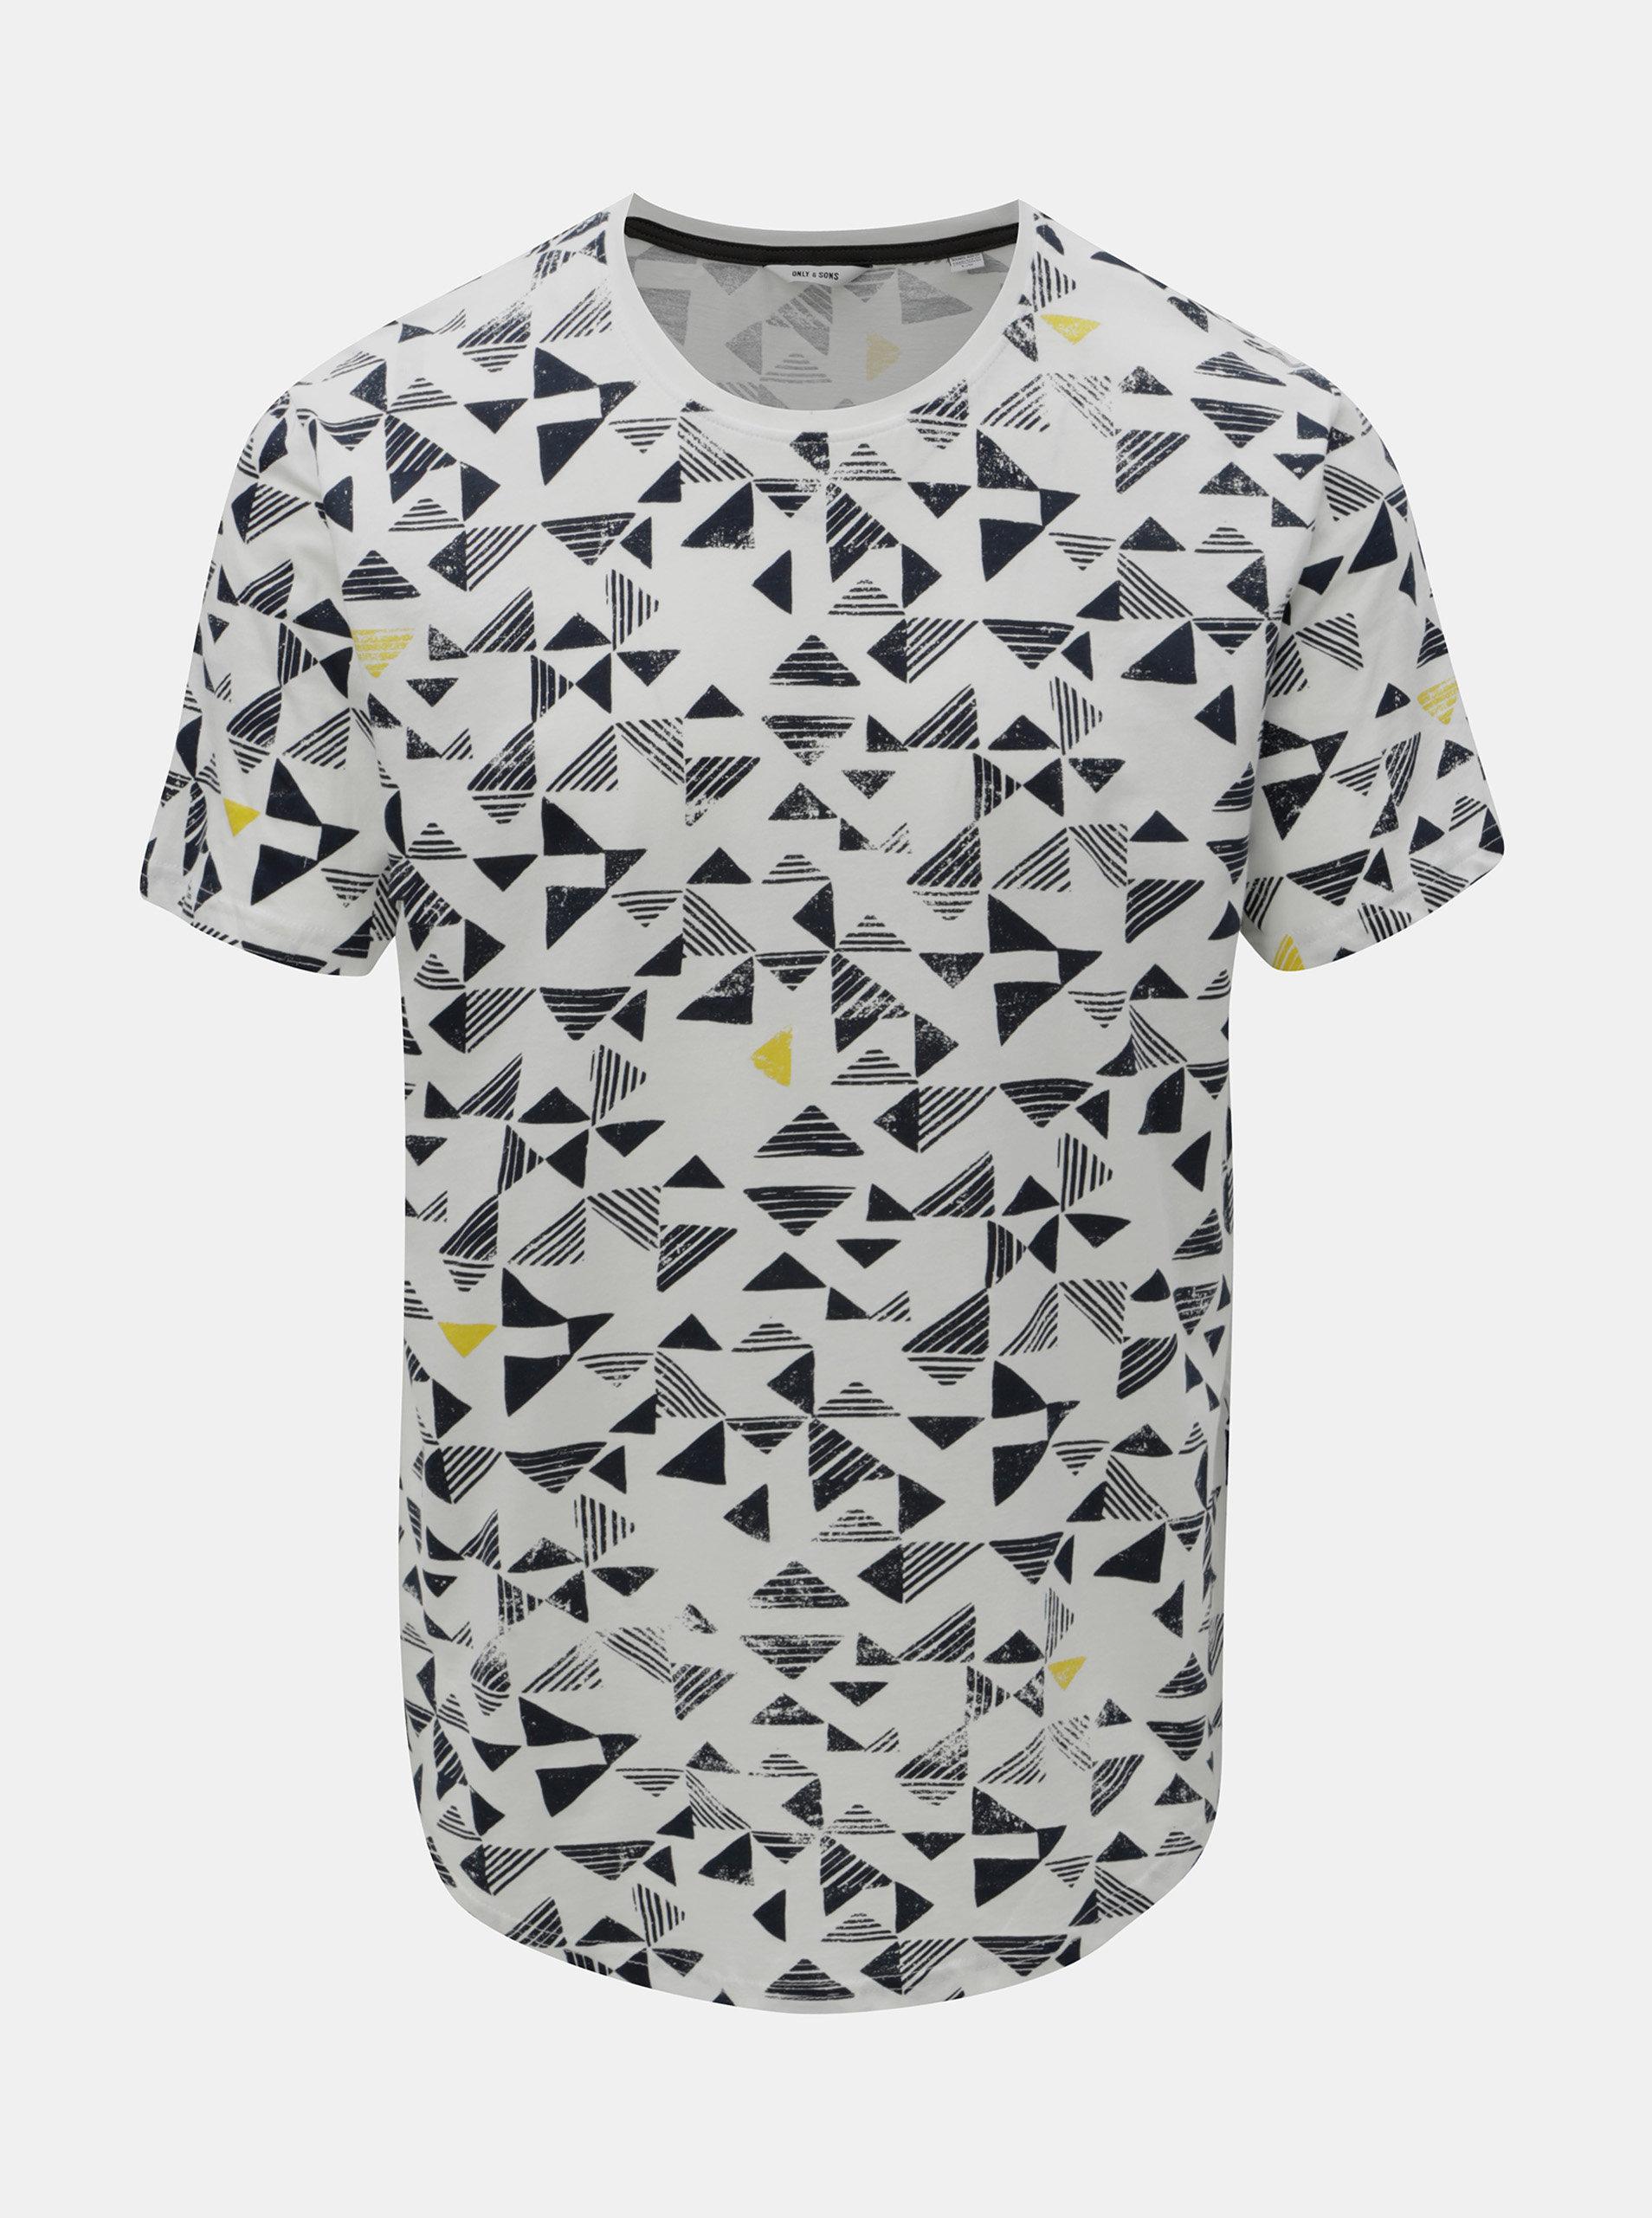 fae8d4ad7137 Biele tričko s geometrickou potlačou ONLY   SONS Gene ...